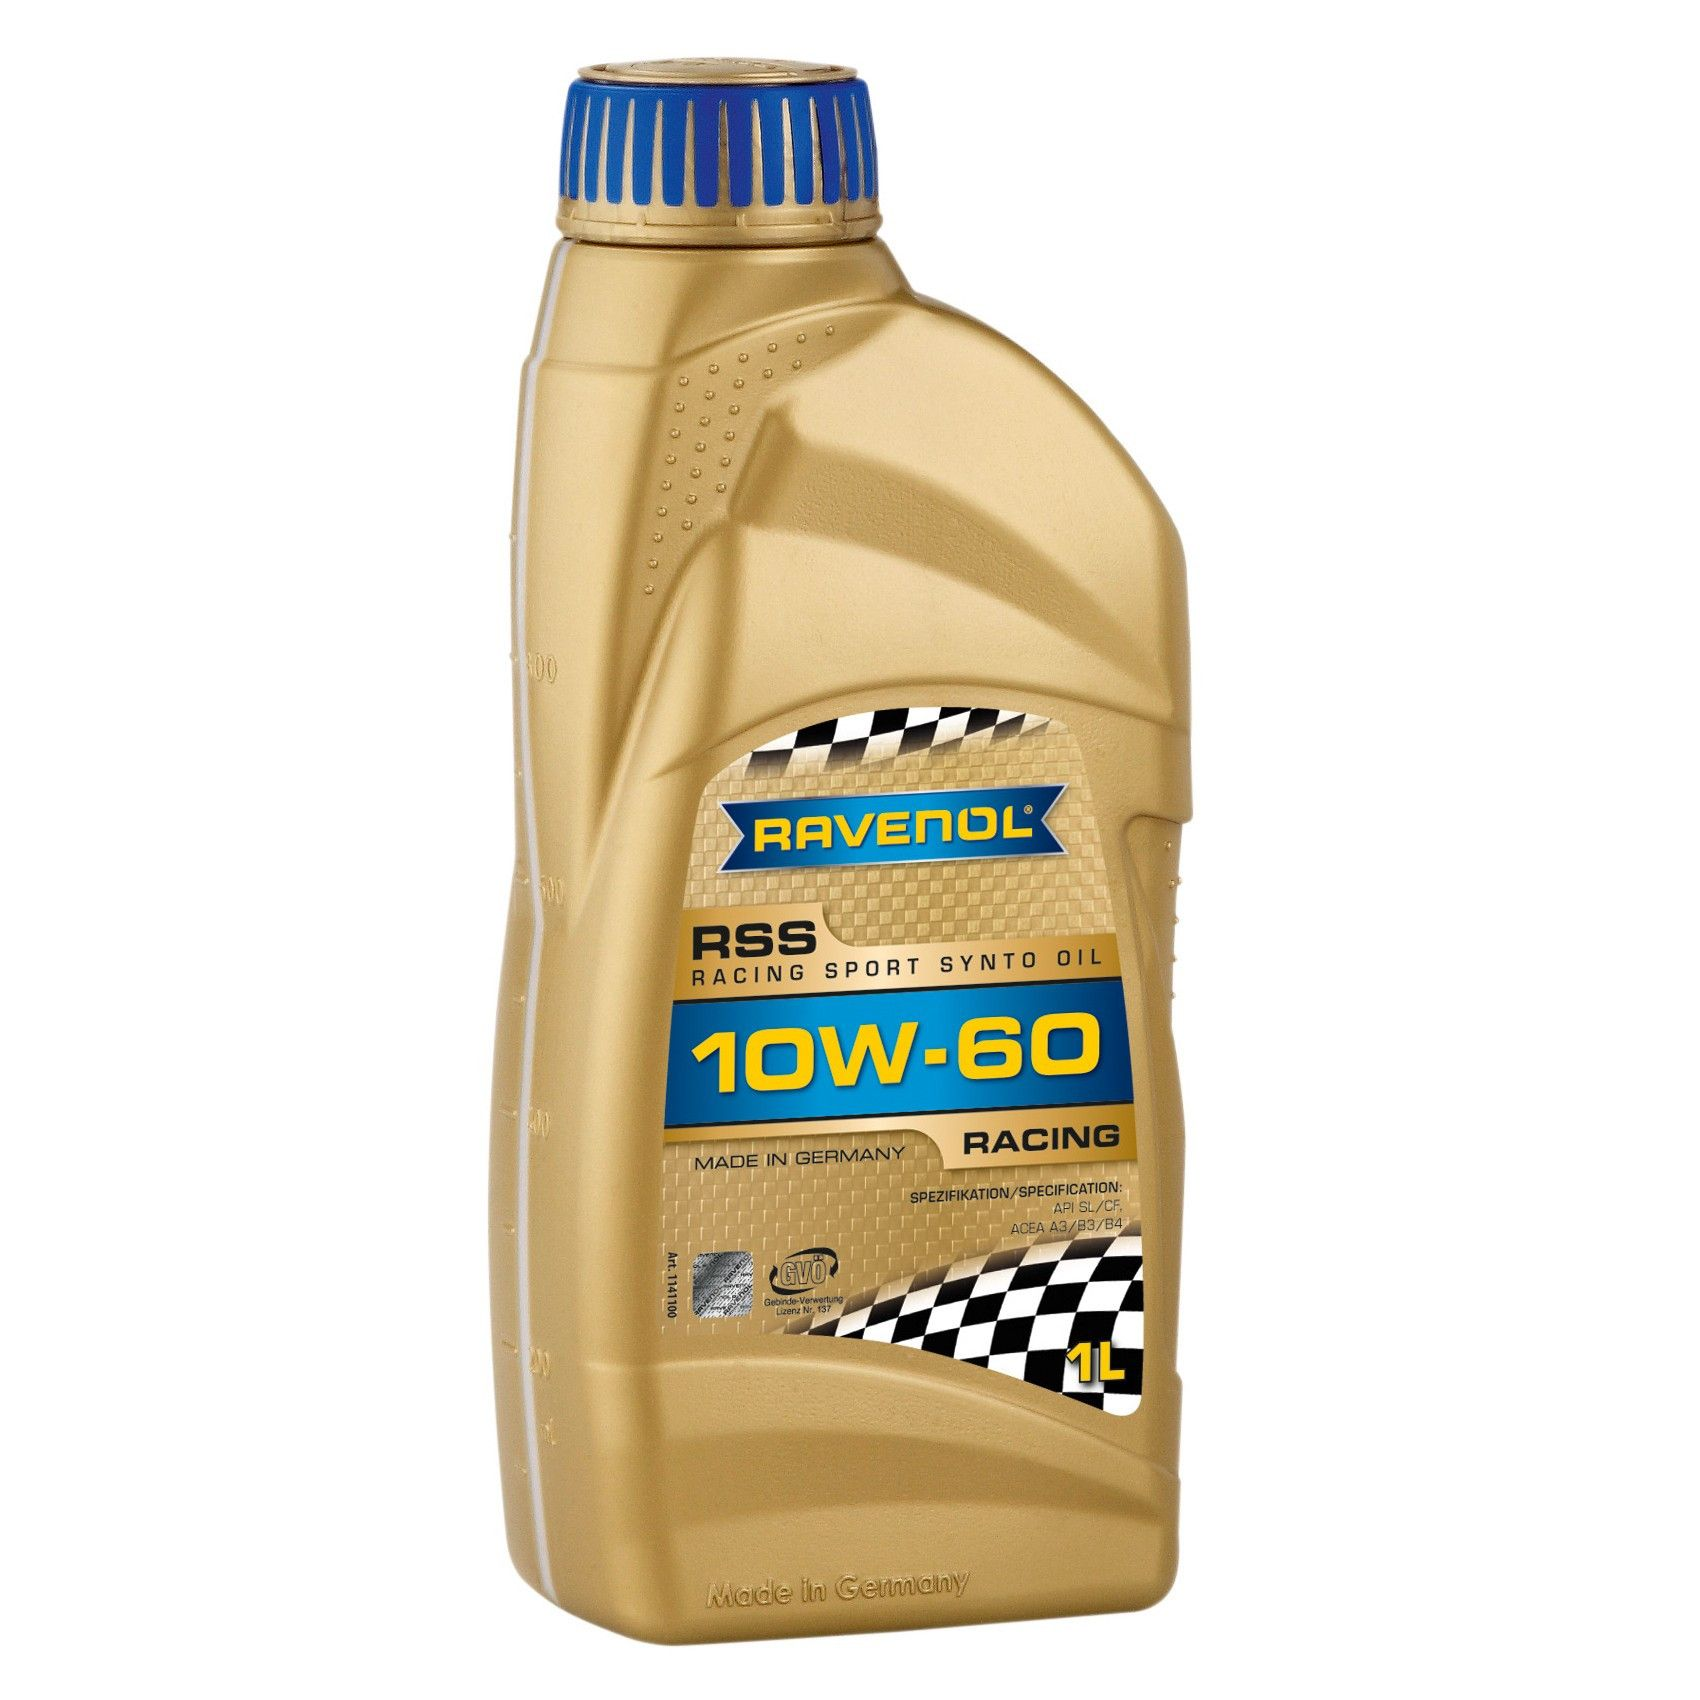 ULEI MOTOR RAVENOL 1141100 RSS Racing Sport Synto 10W60 1L